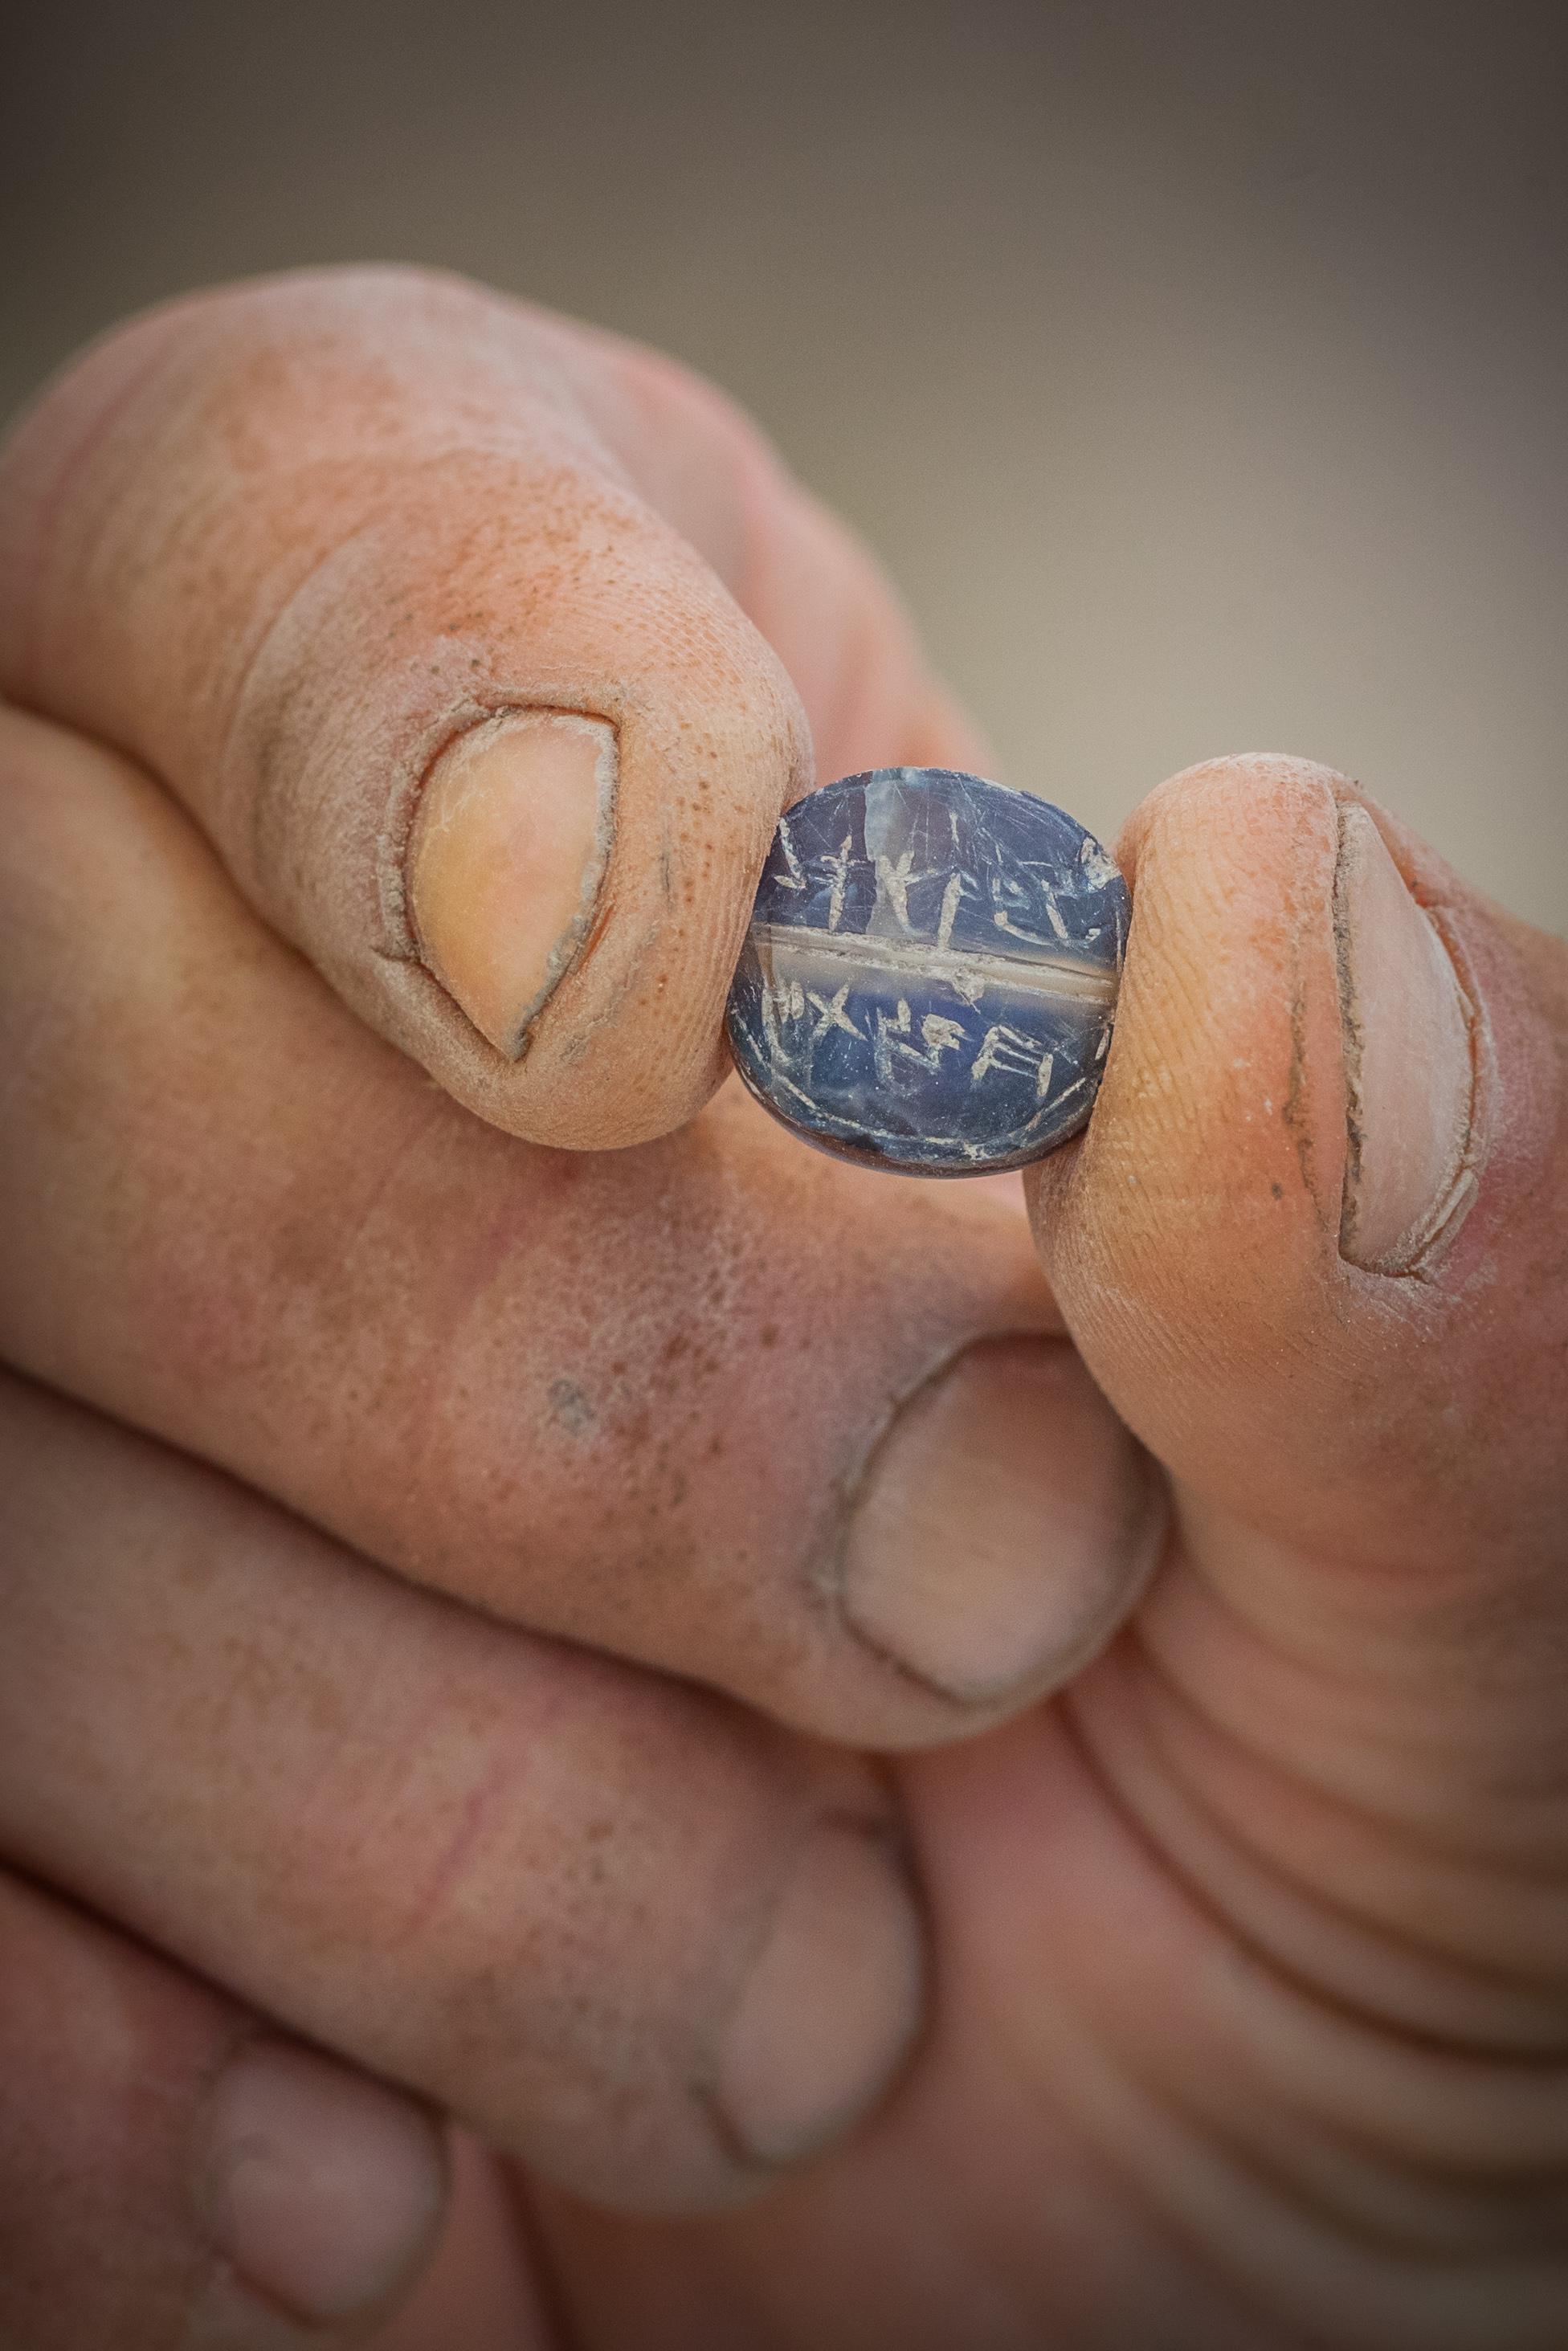 The Ikar Ben Matanyahu seal found in the City of David